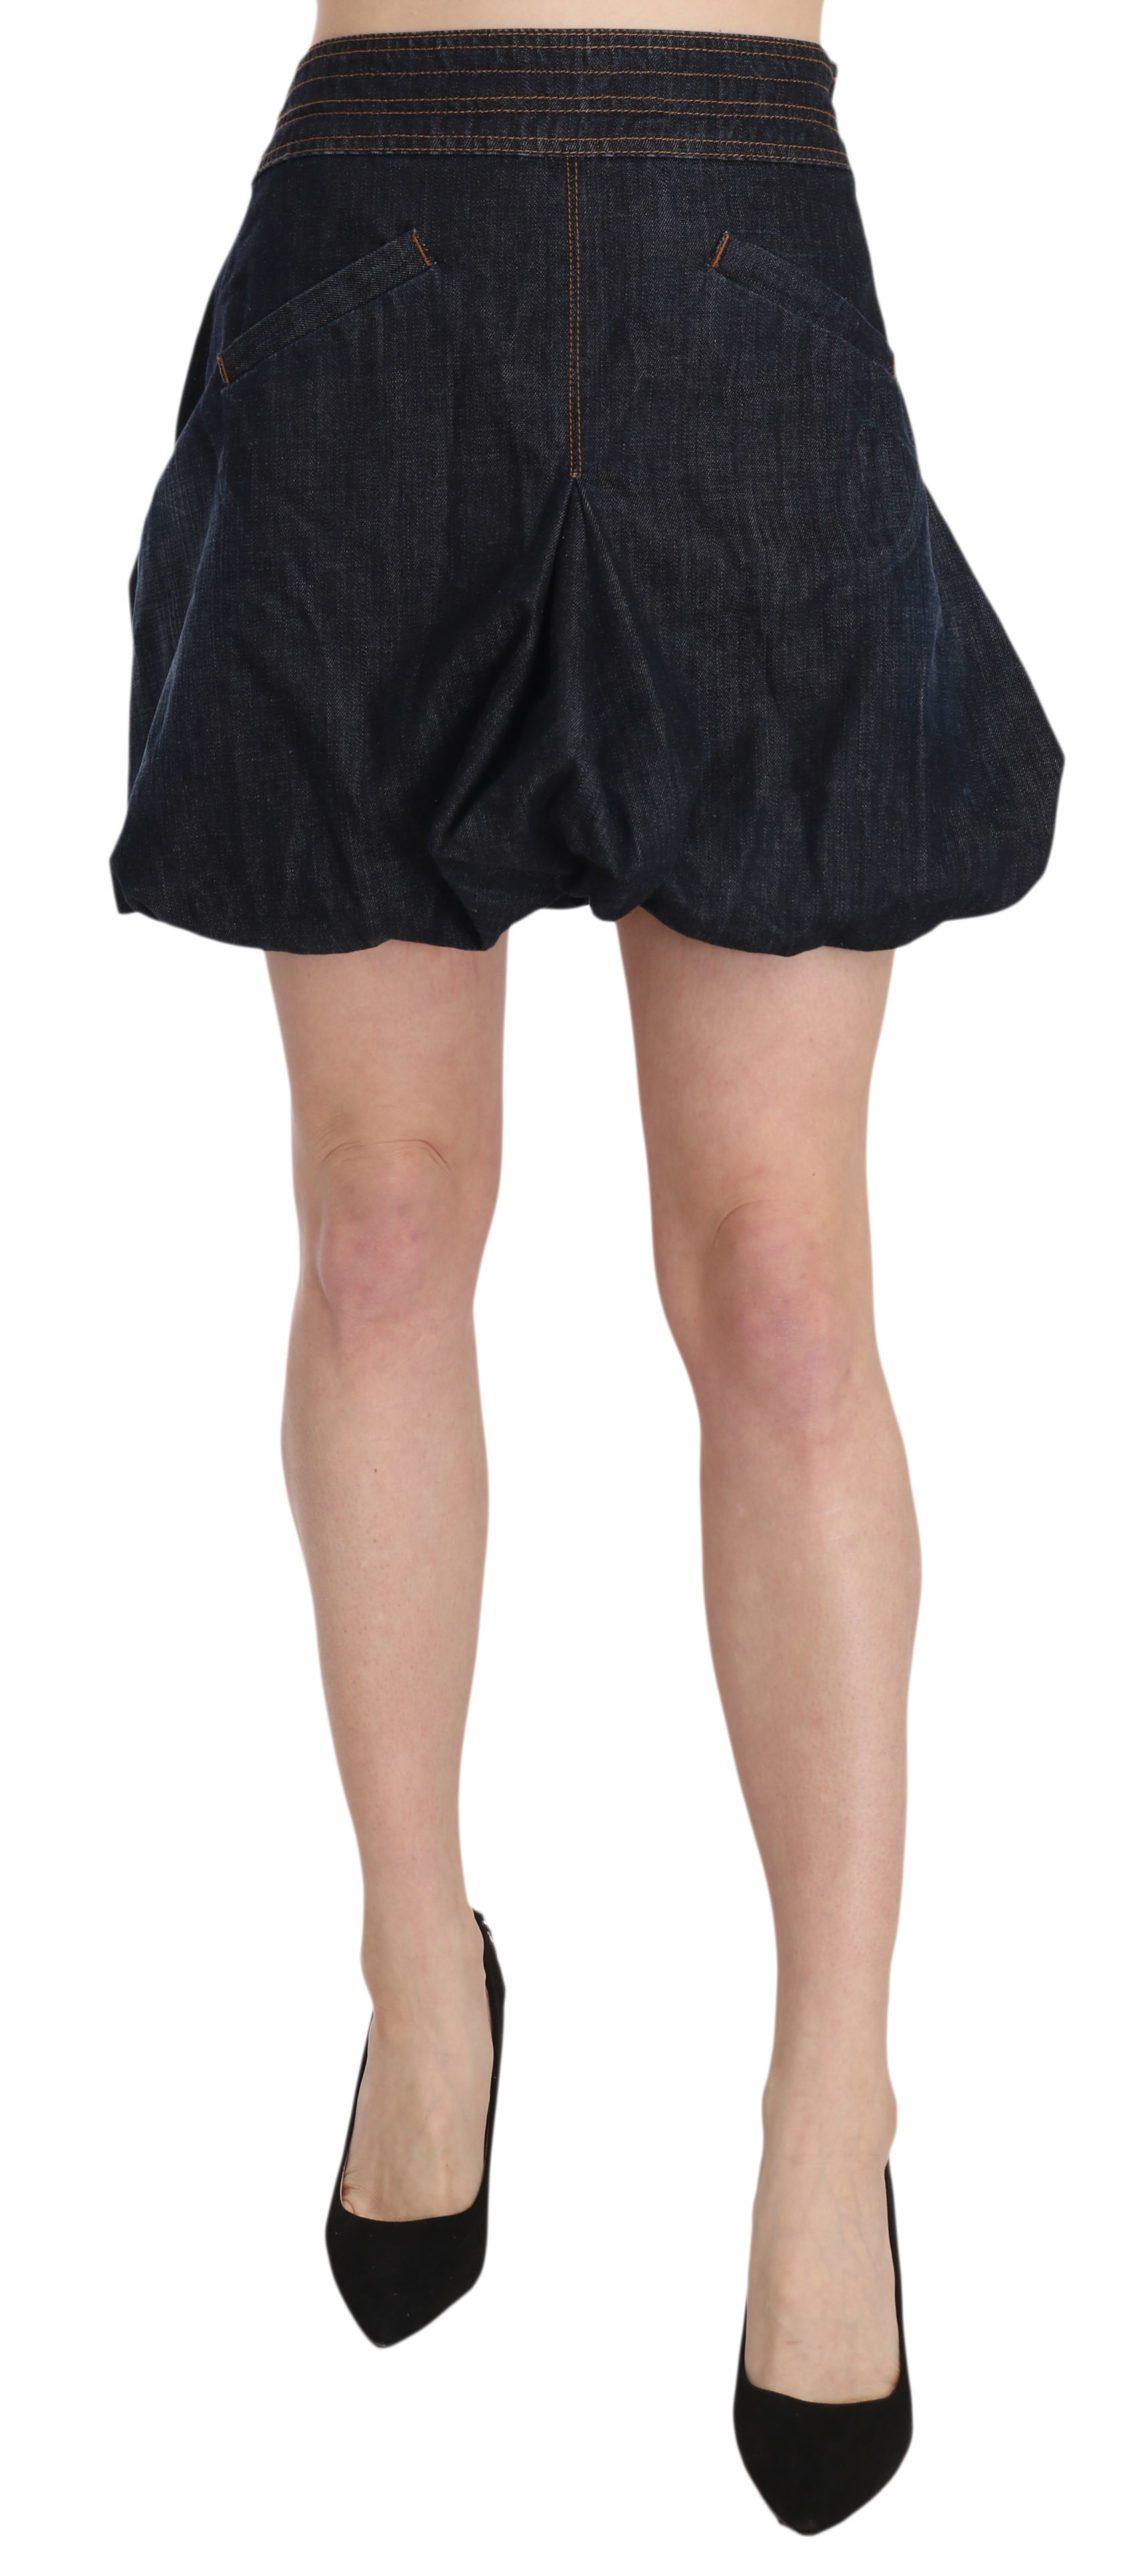 Exte Women's Denim Cotton Stretch A-line Mini Skirt Blue PAN70172 - IT42|M